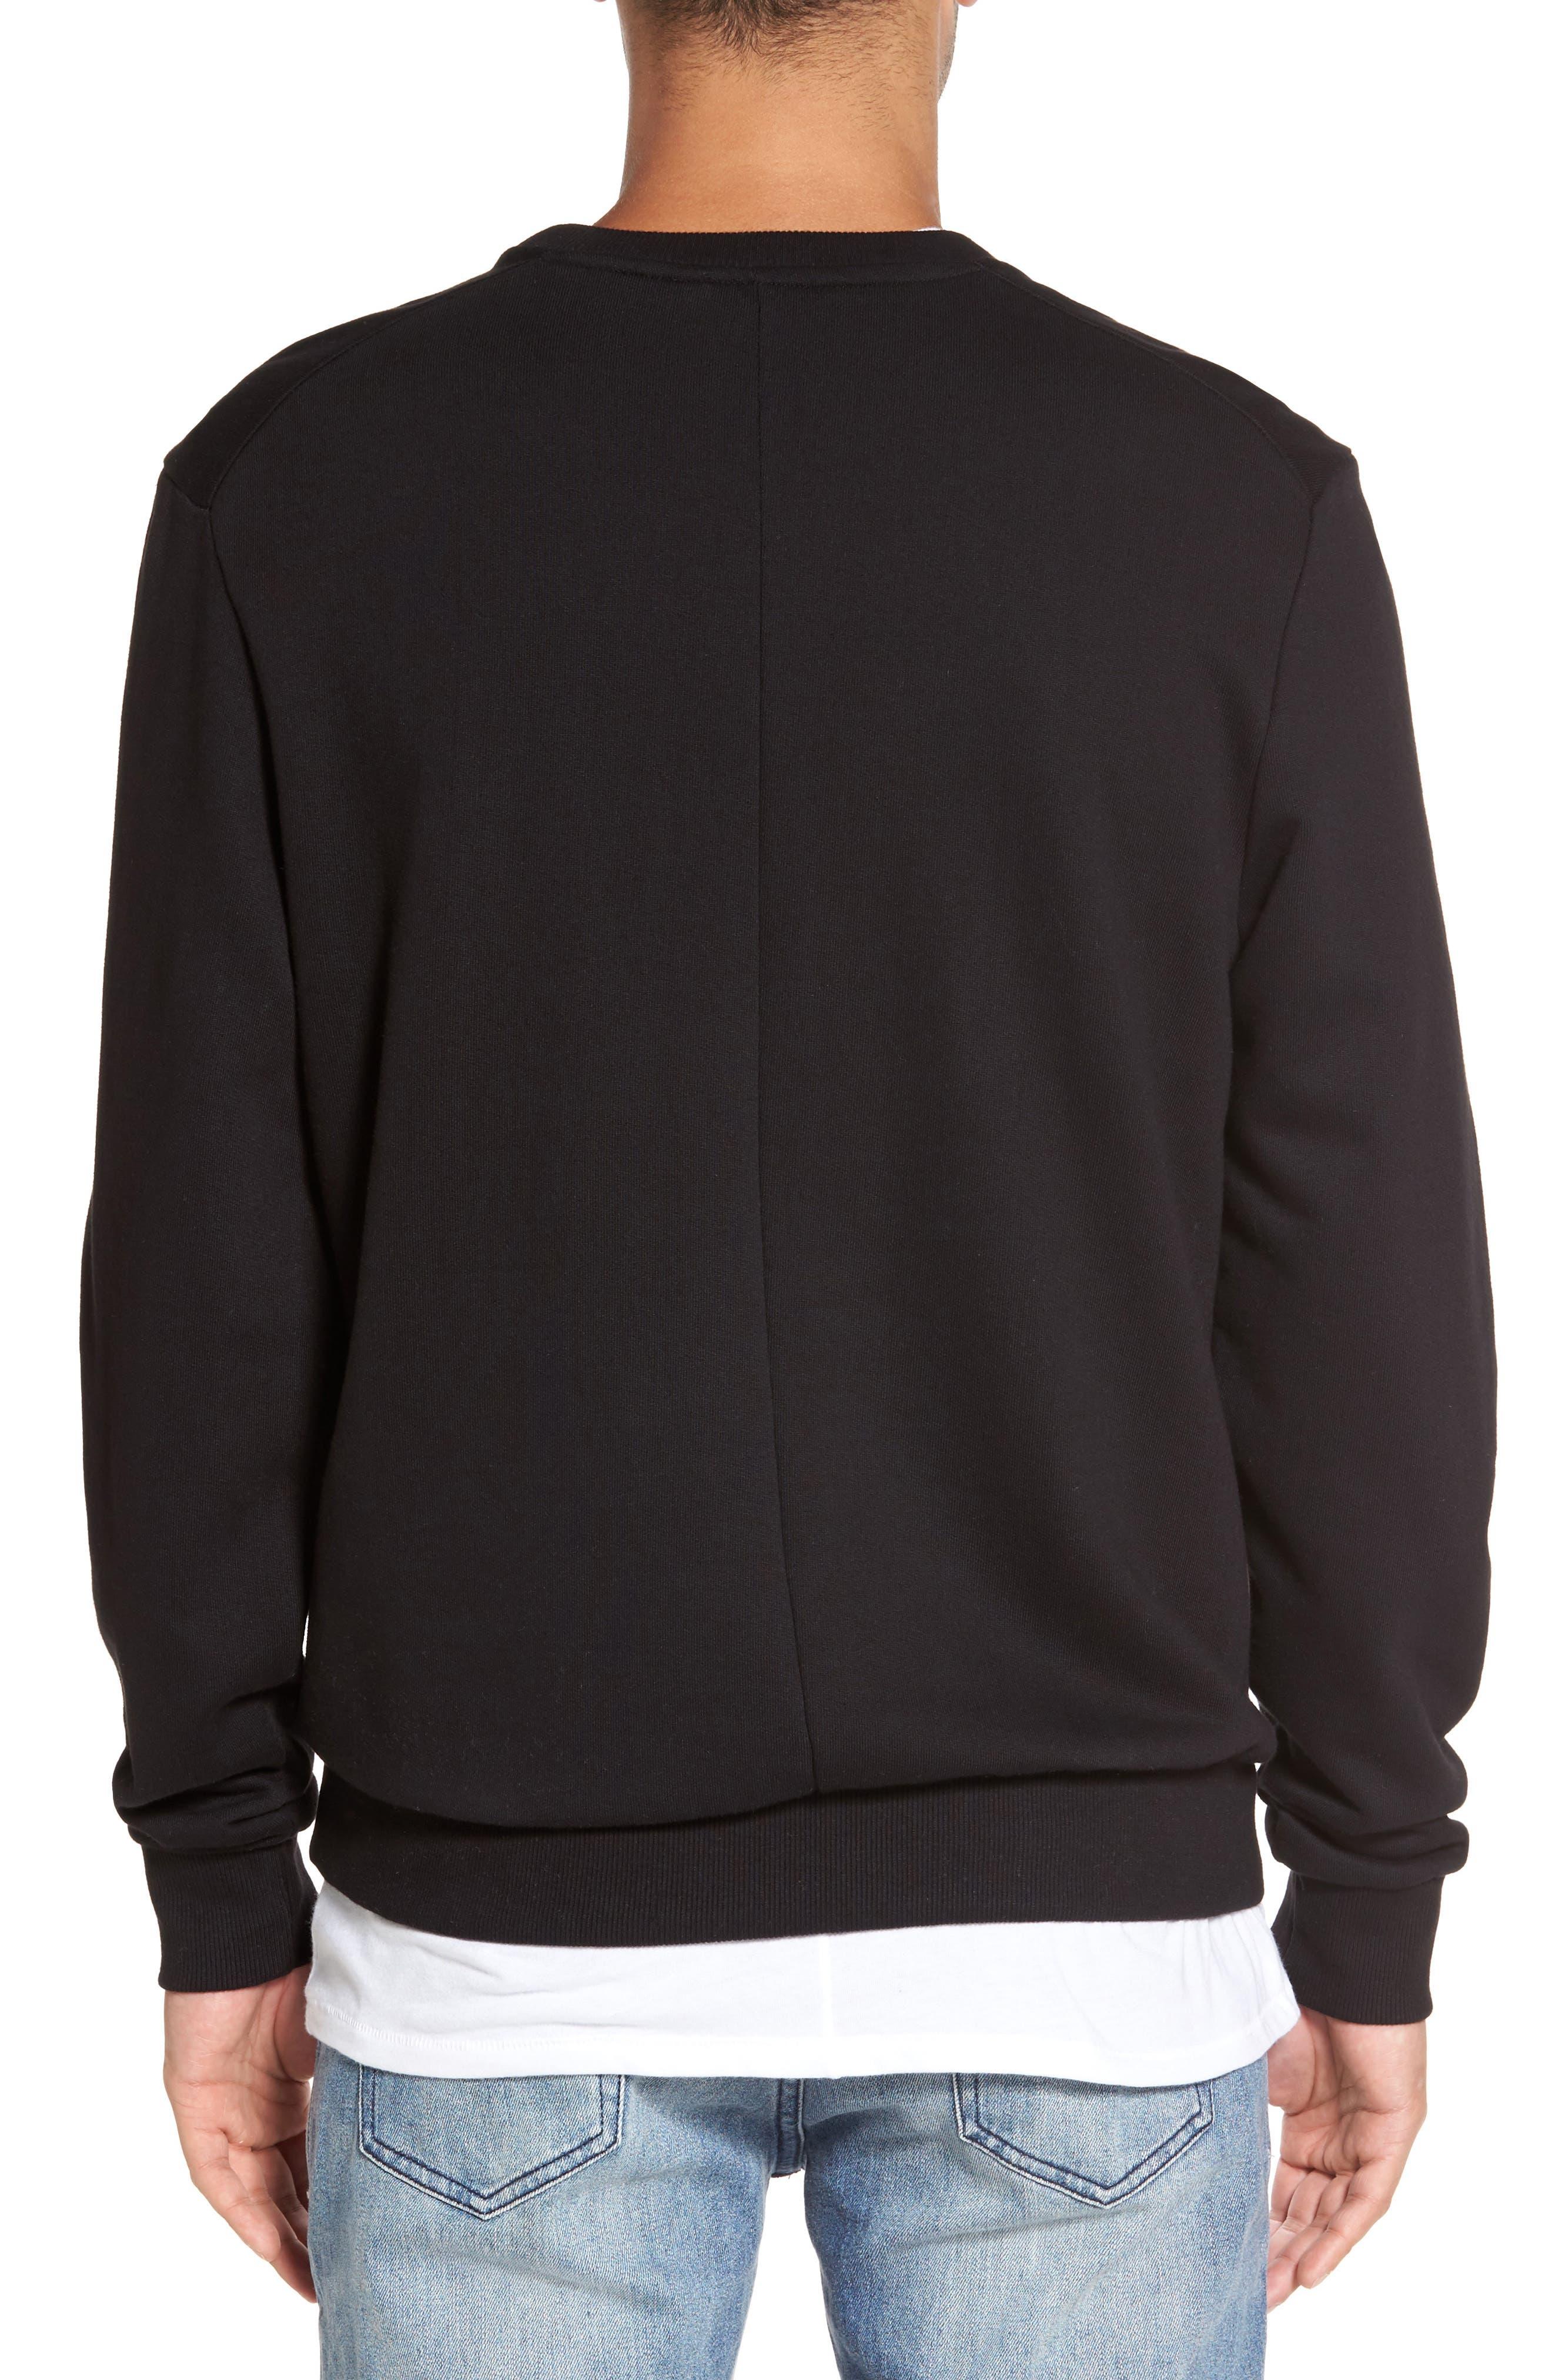 Nolan Embroidered Sweatshirt,                             Alternate thumbnail 2, color,                             Black